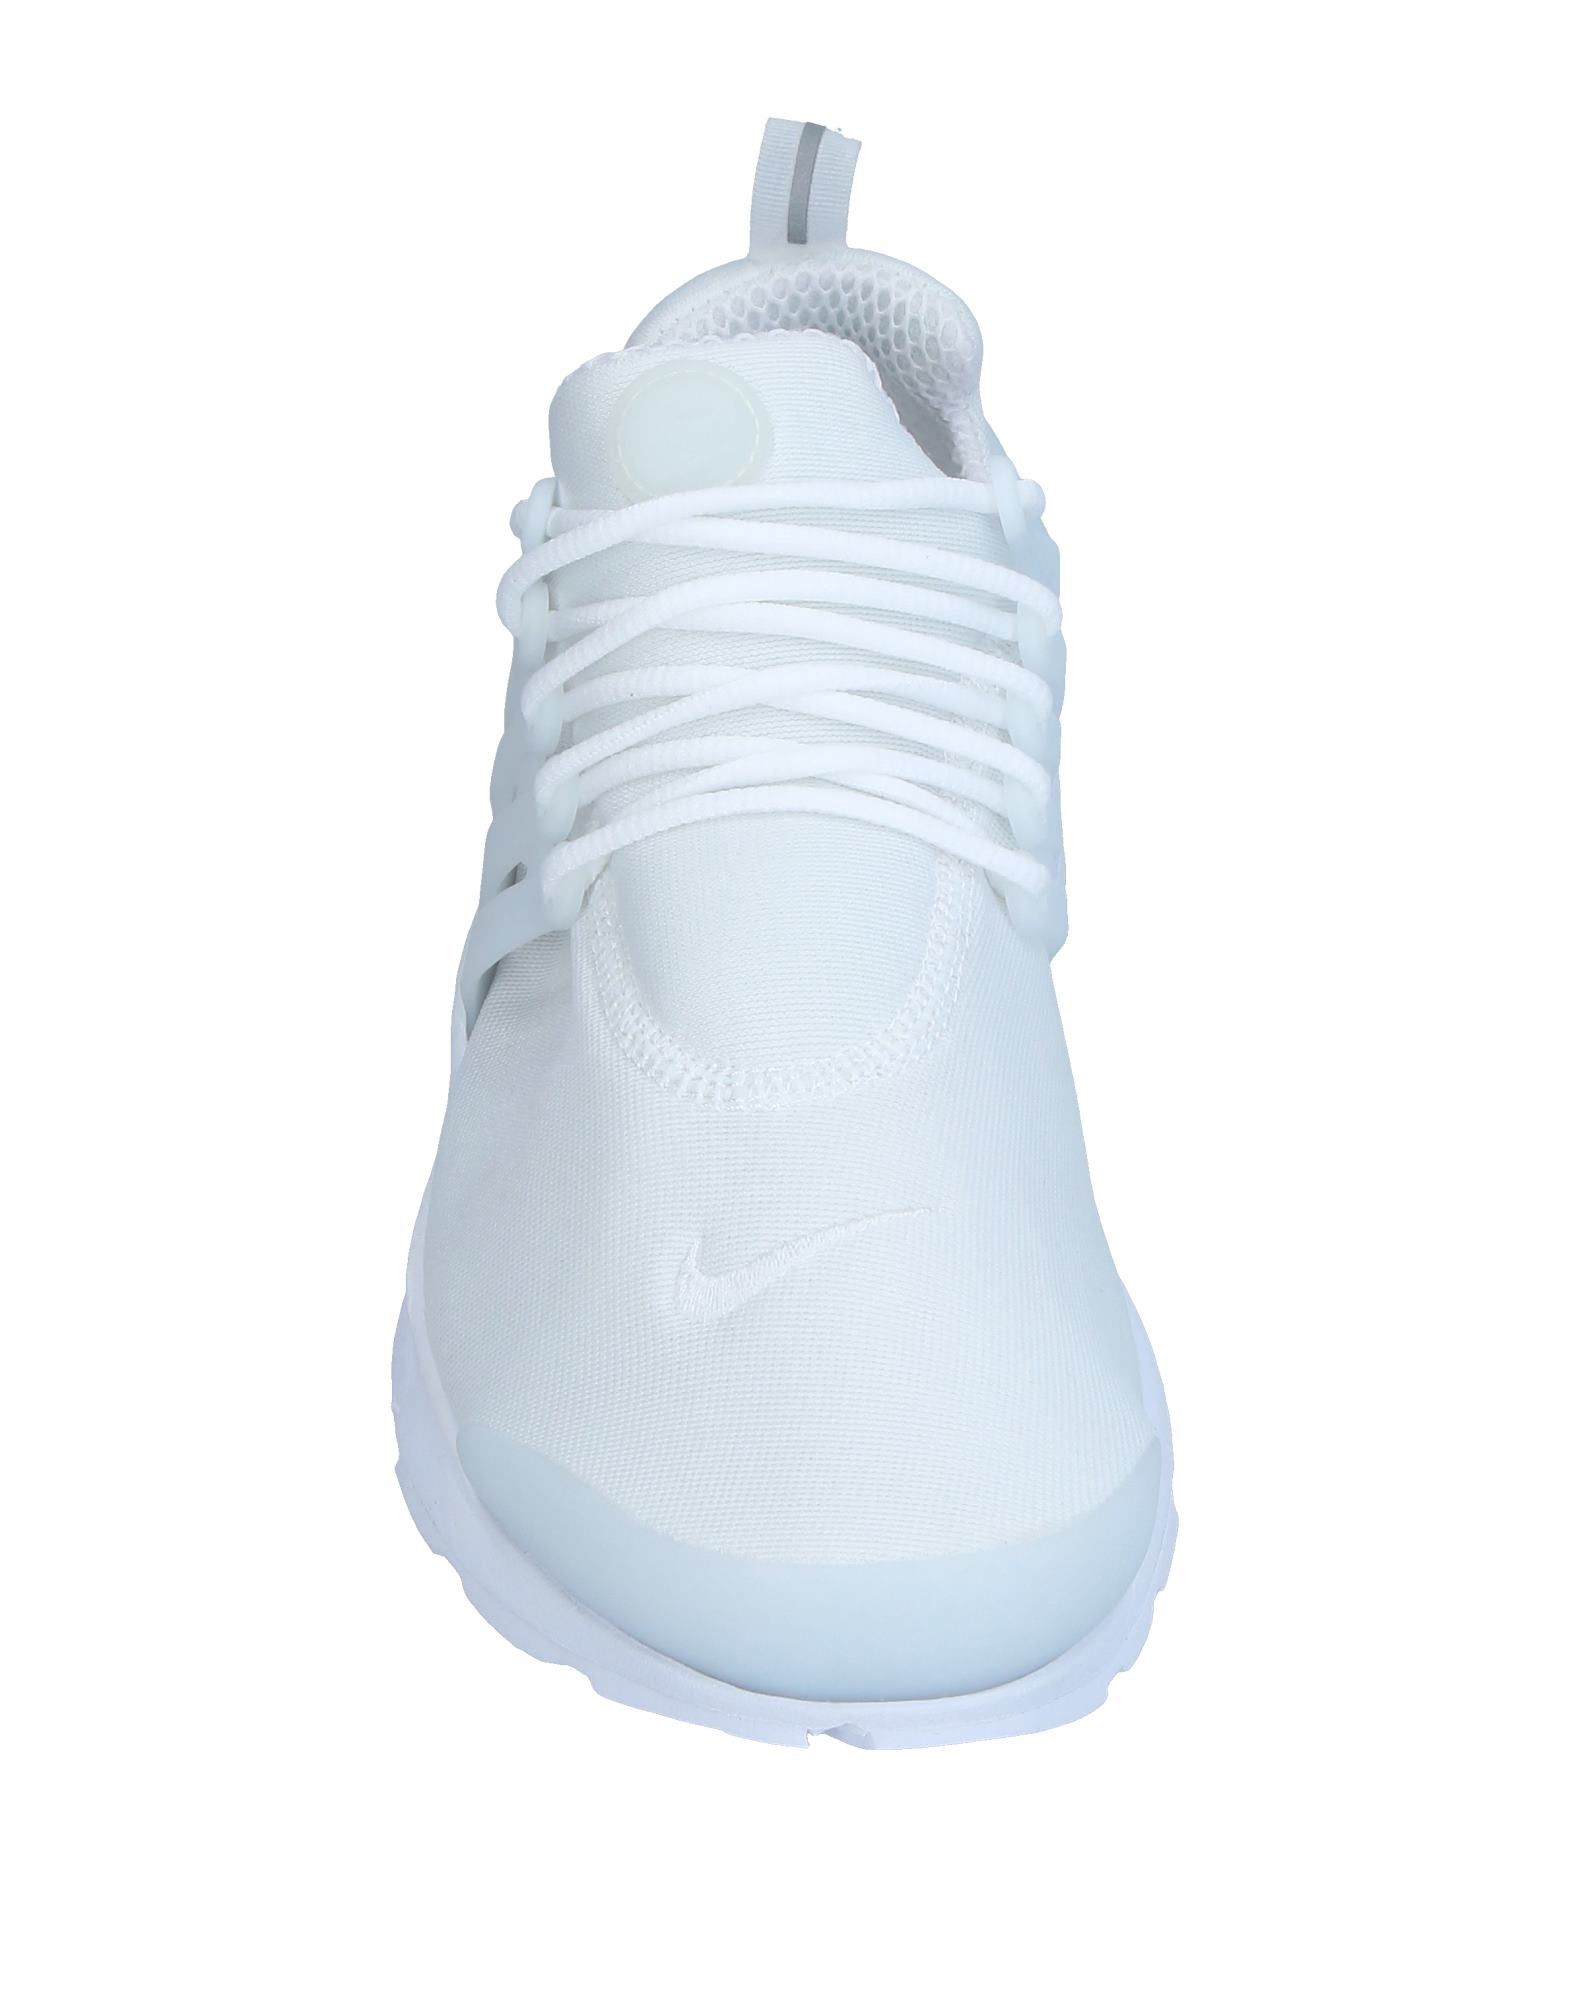 Nike Sneakers 11335596AG Herren  11335596AG Sneakers Heiße Schuhe ae4d1e